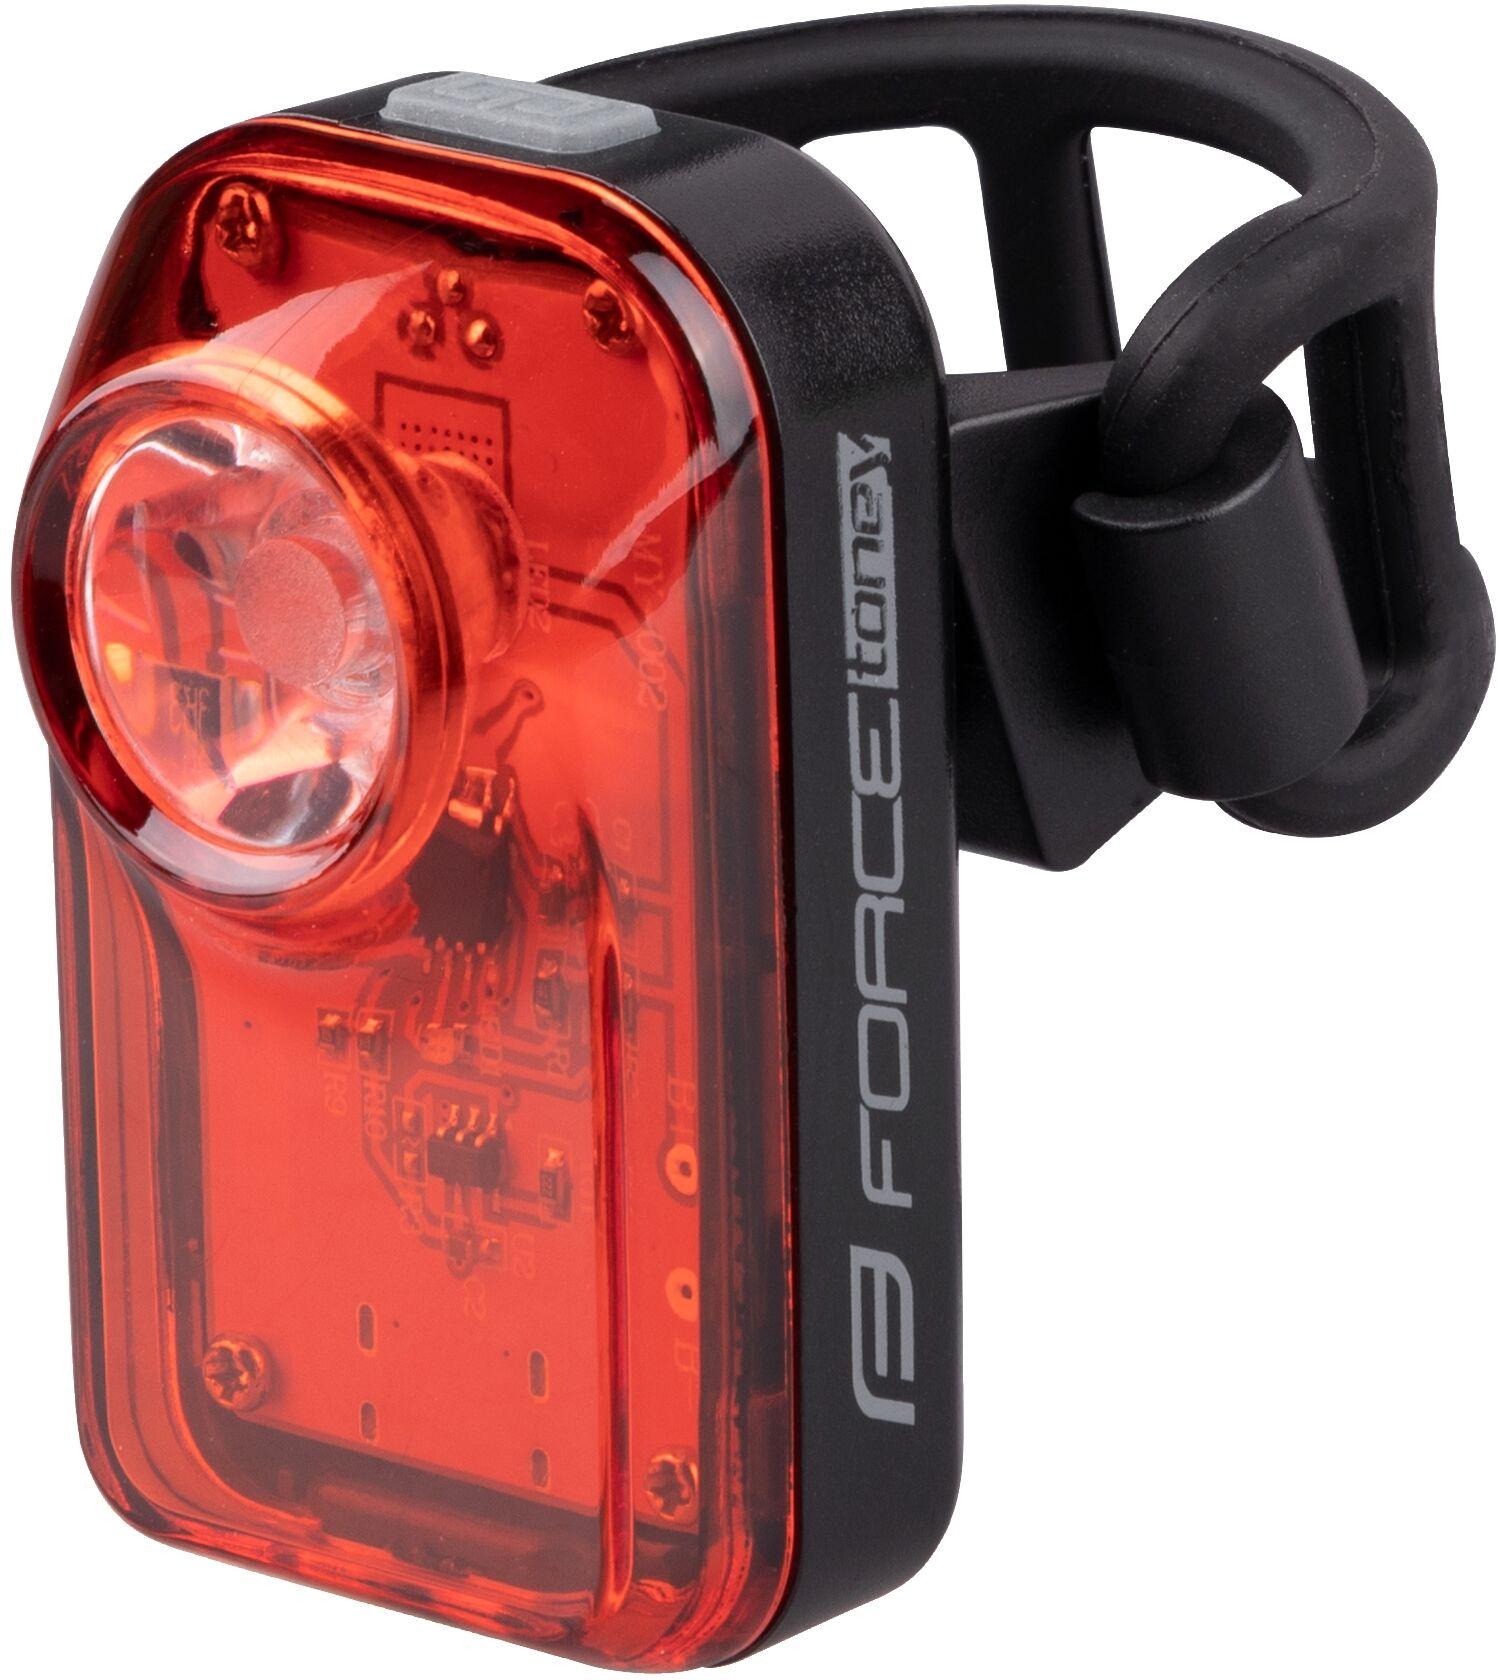 FORCE Lampka rowerowa tylna TONEY 70 LM, 1 x LED, USB 453739,8592627166051